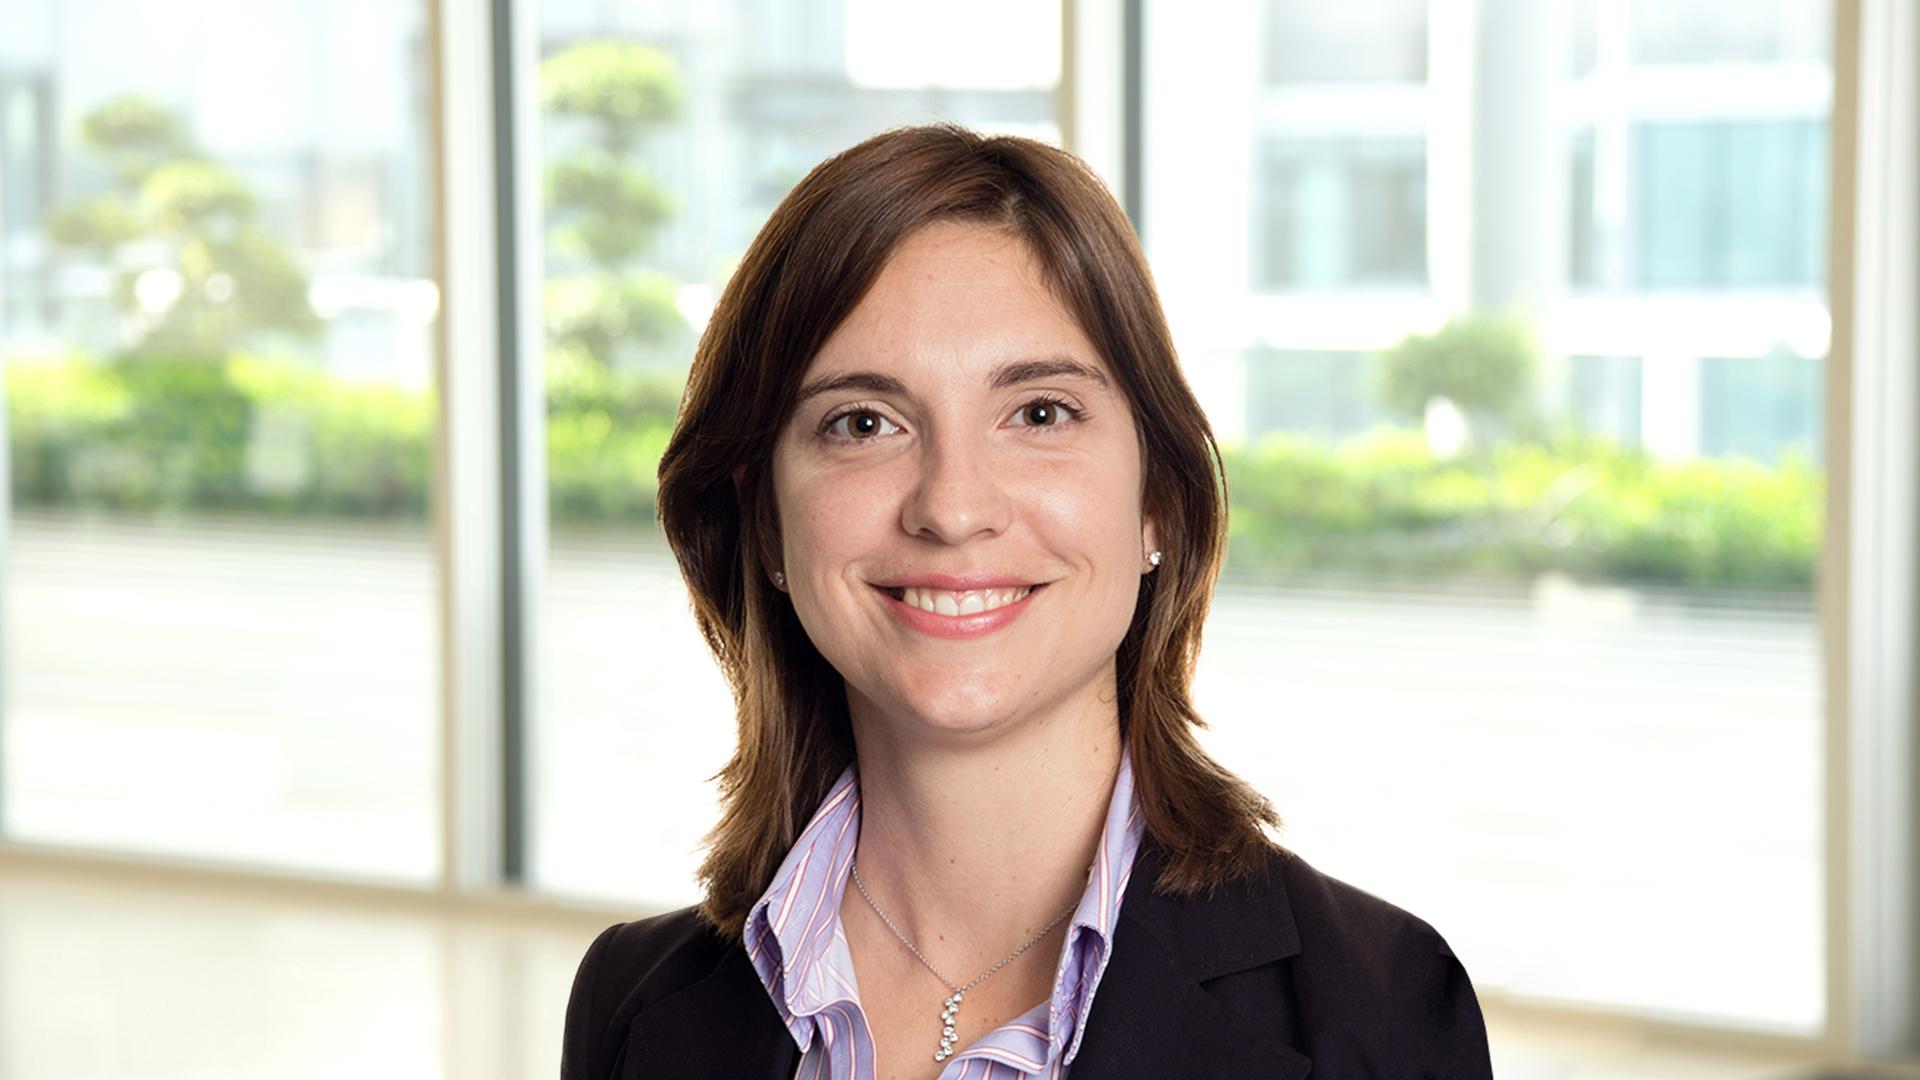 Christina Pretorius